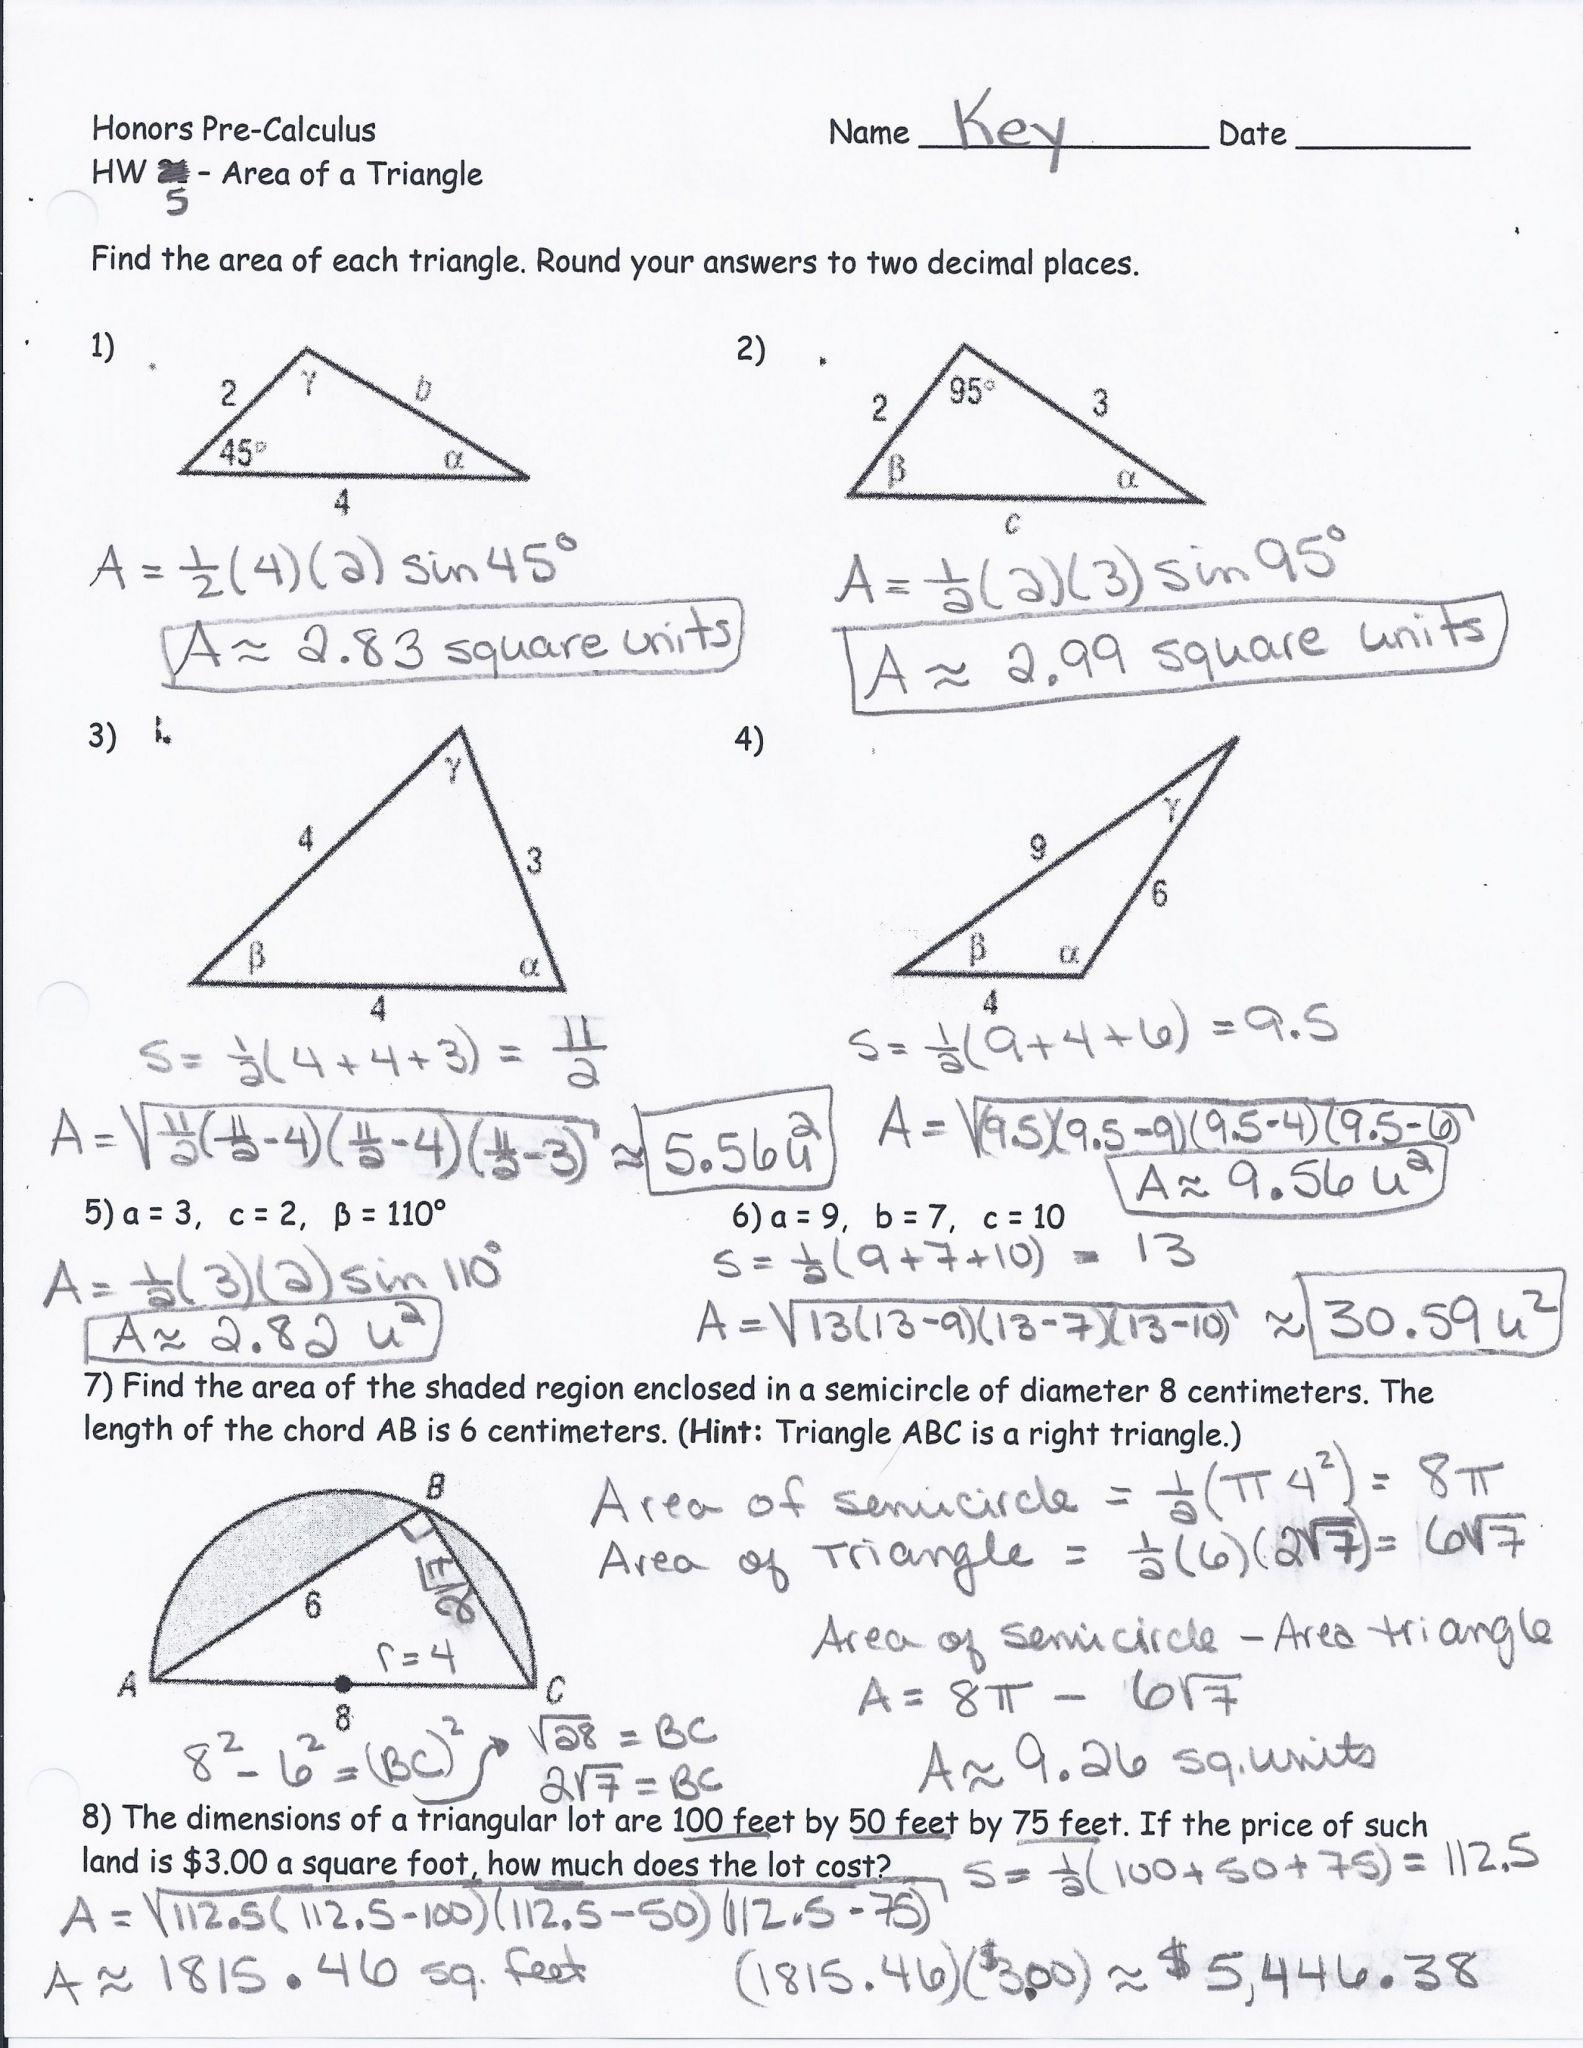 Chemistry Unit 7 Worksheet 2 Answers